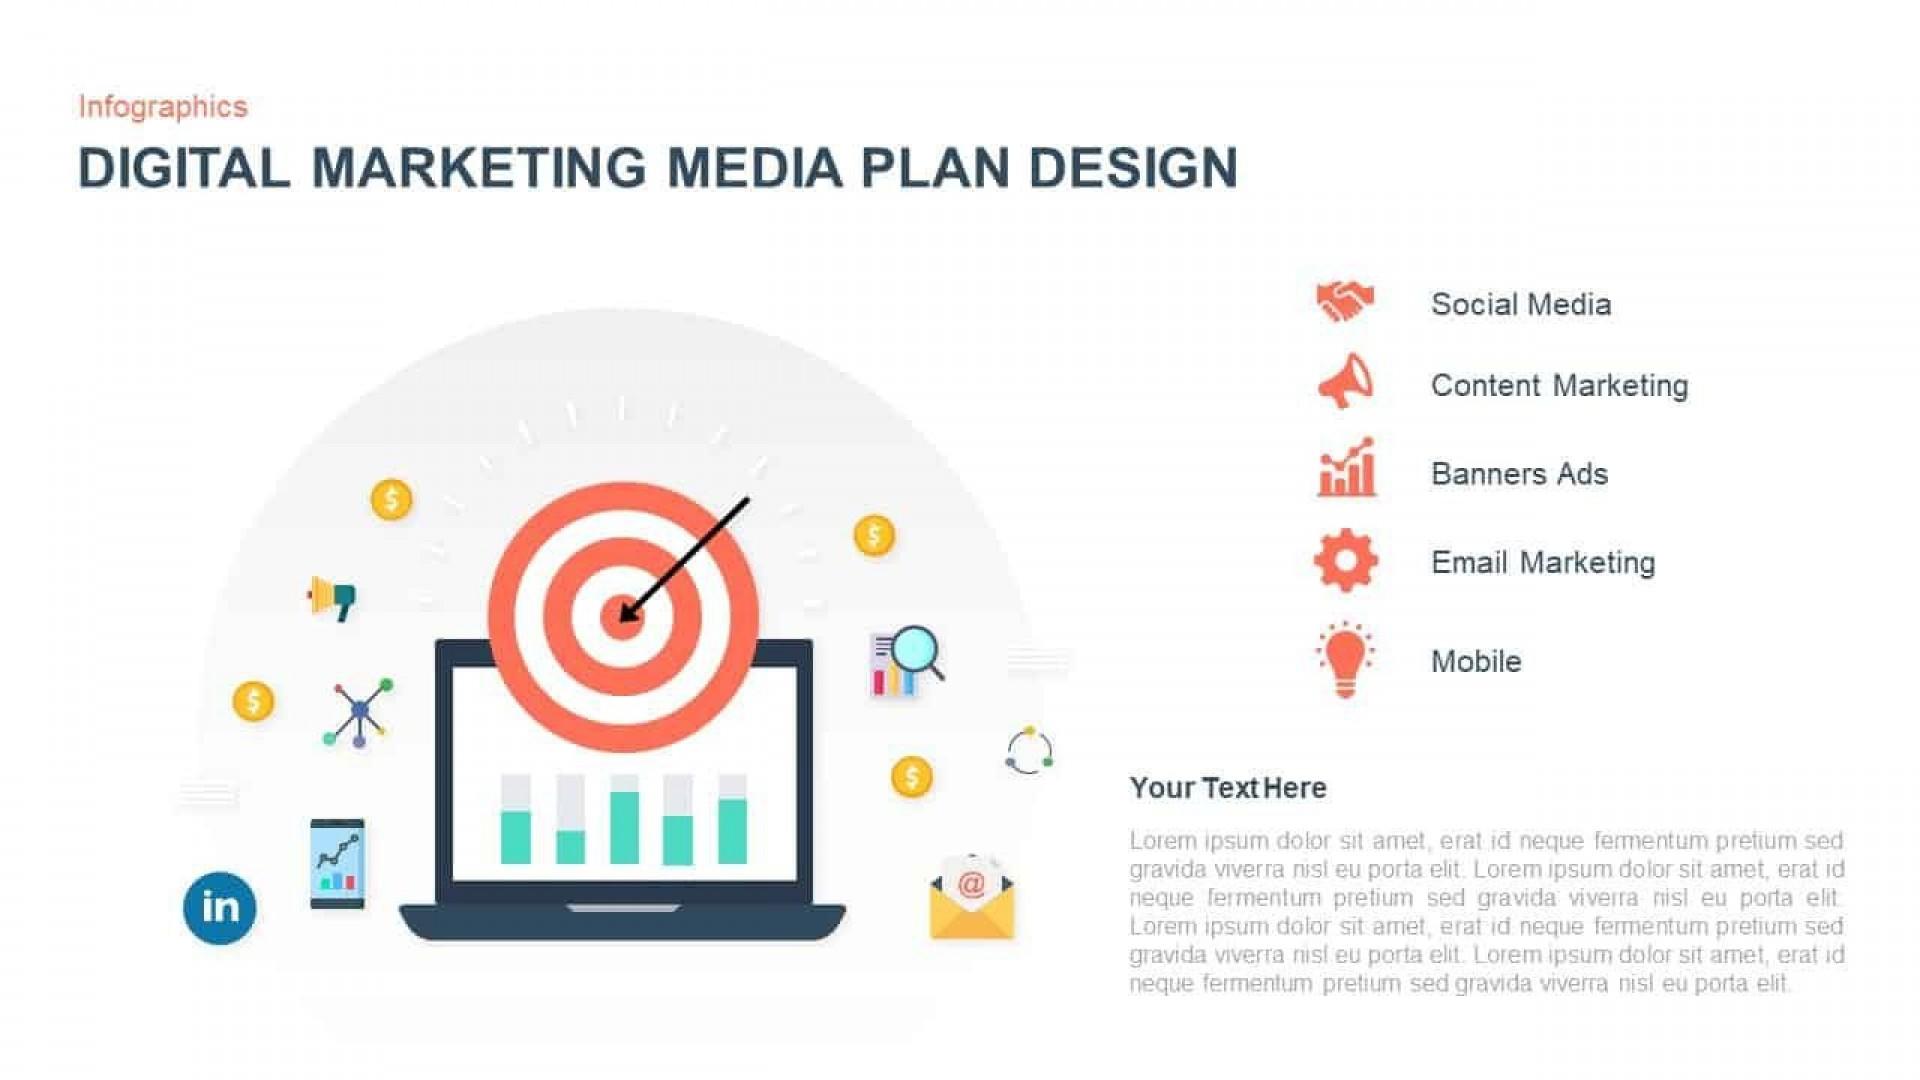 003 Unusual Digital Marketing Plan Template Ppt Image  Presentation Free Slideshare1920